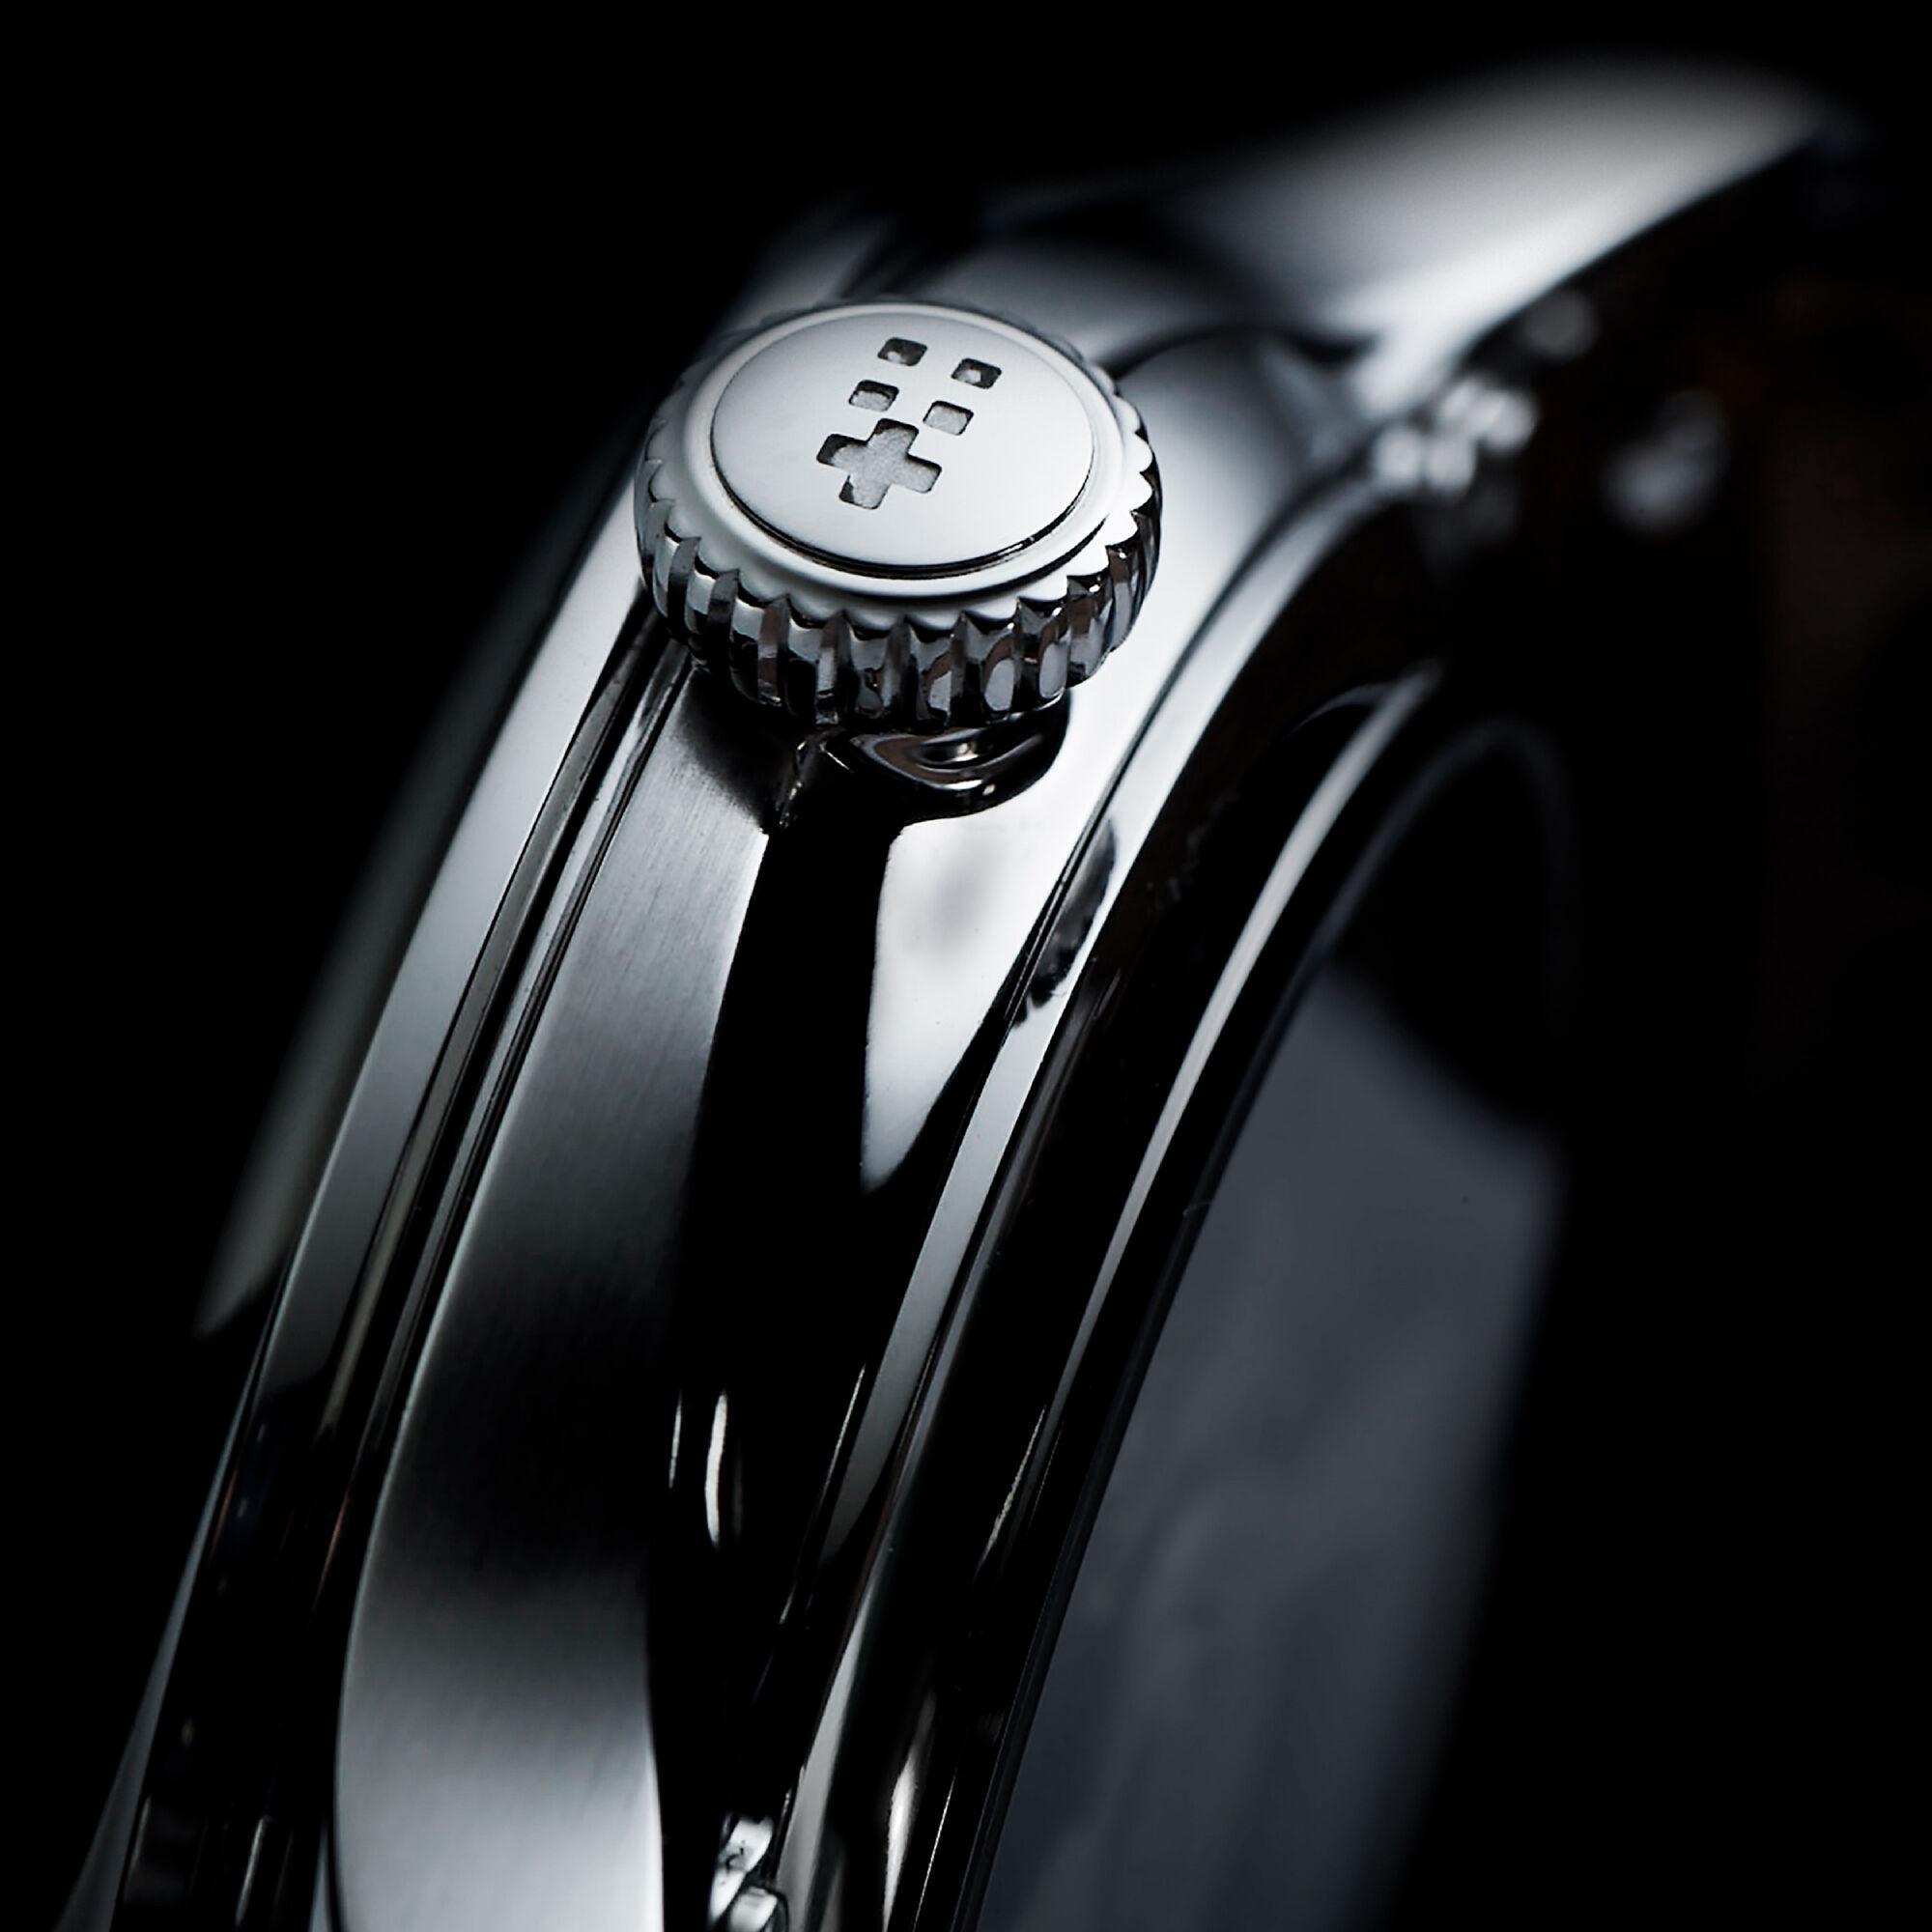 C1 Power Reserve Chronometer